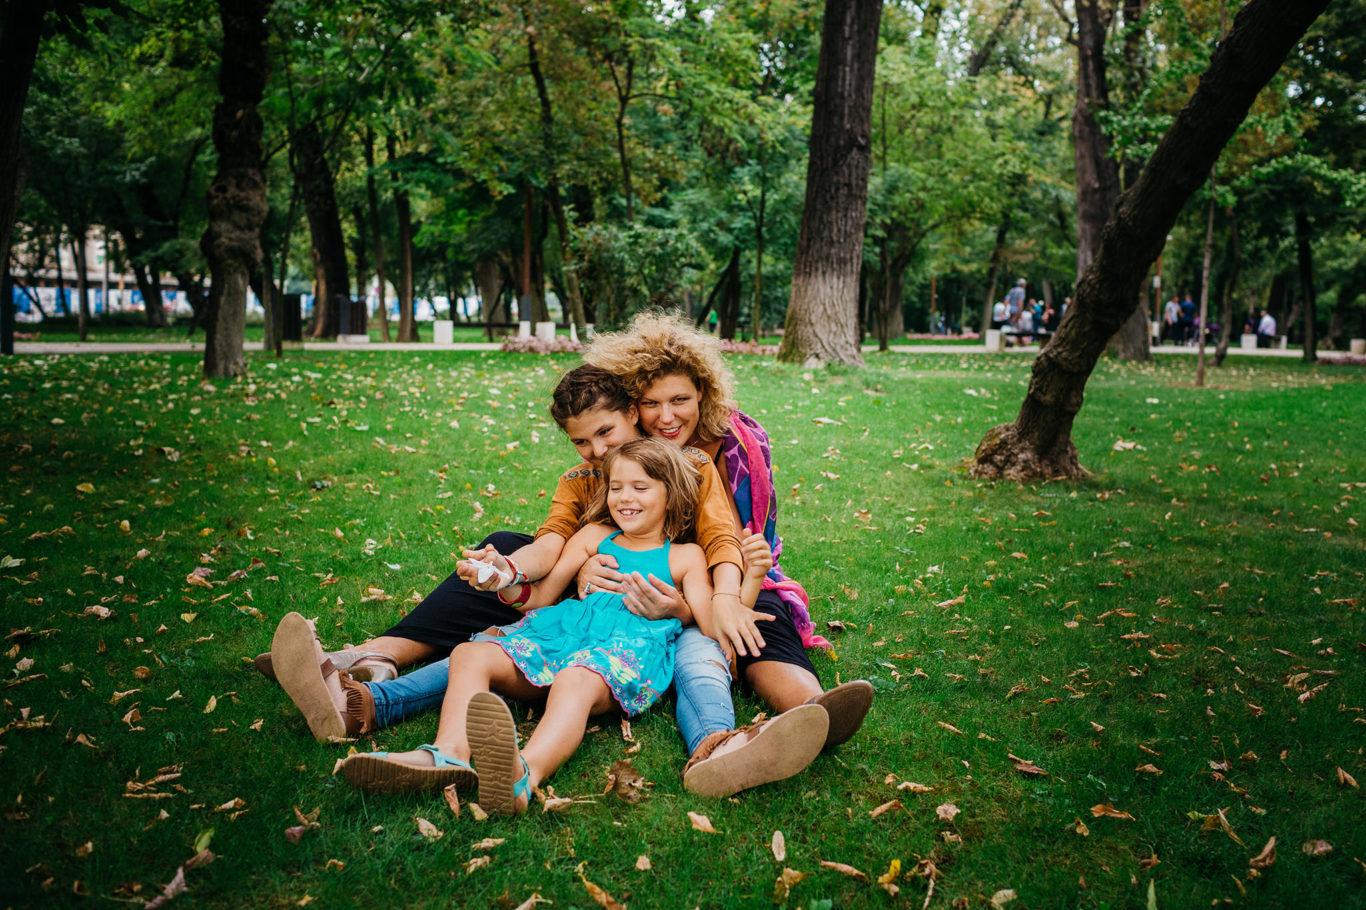 0148-fotografii-familie-ioana-alex-maia-roxi-fotograf-ciprian-dumitrescu-cd2_2091